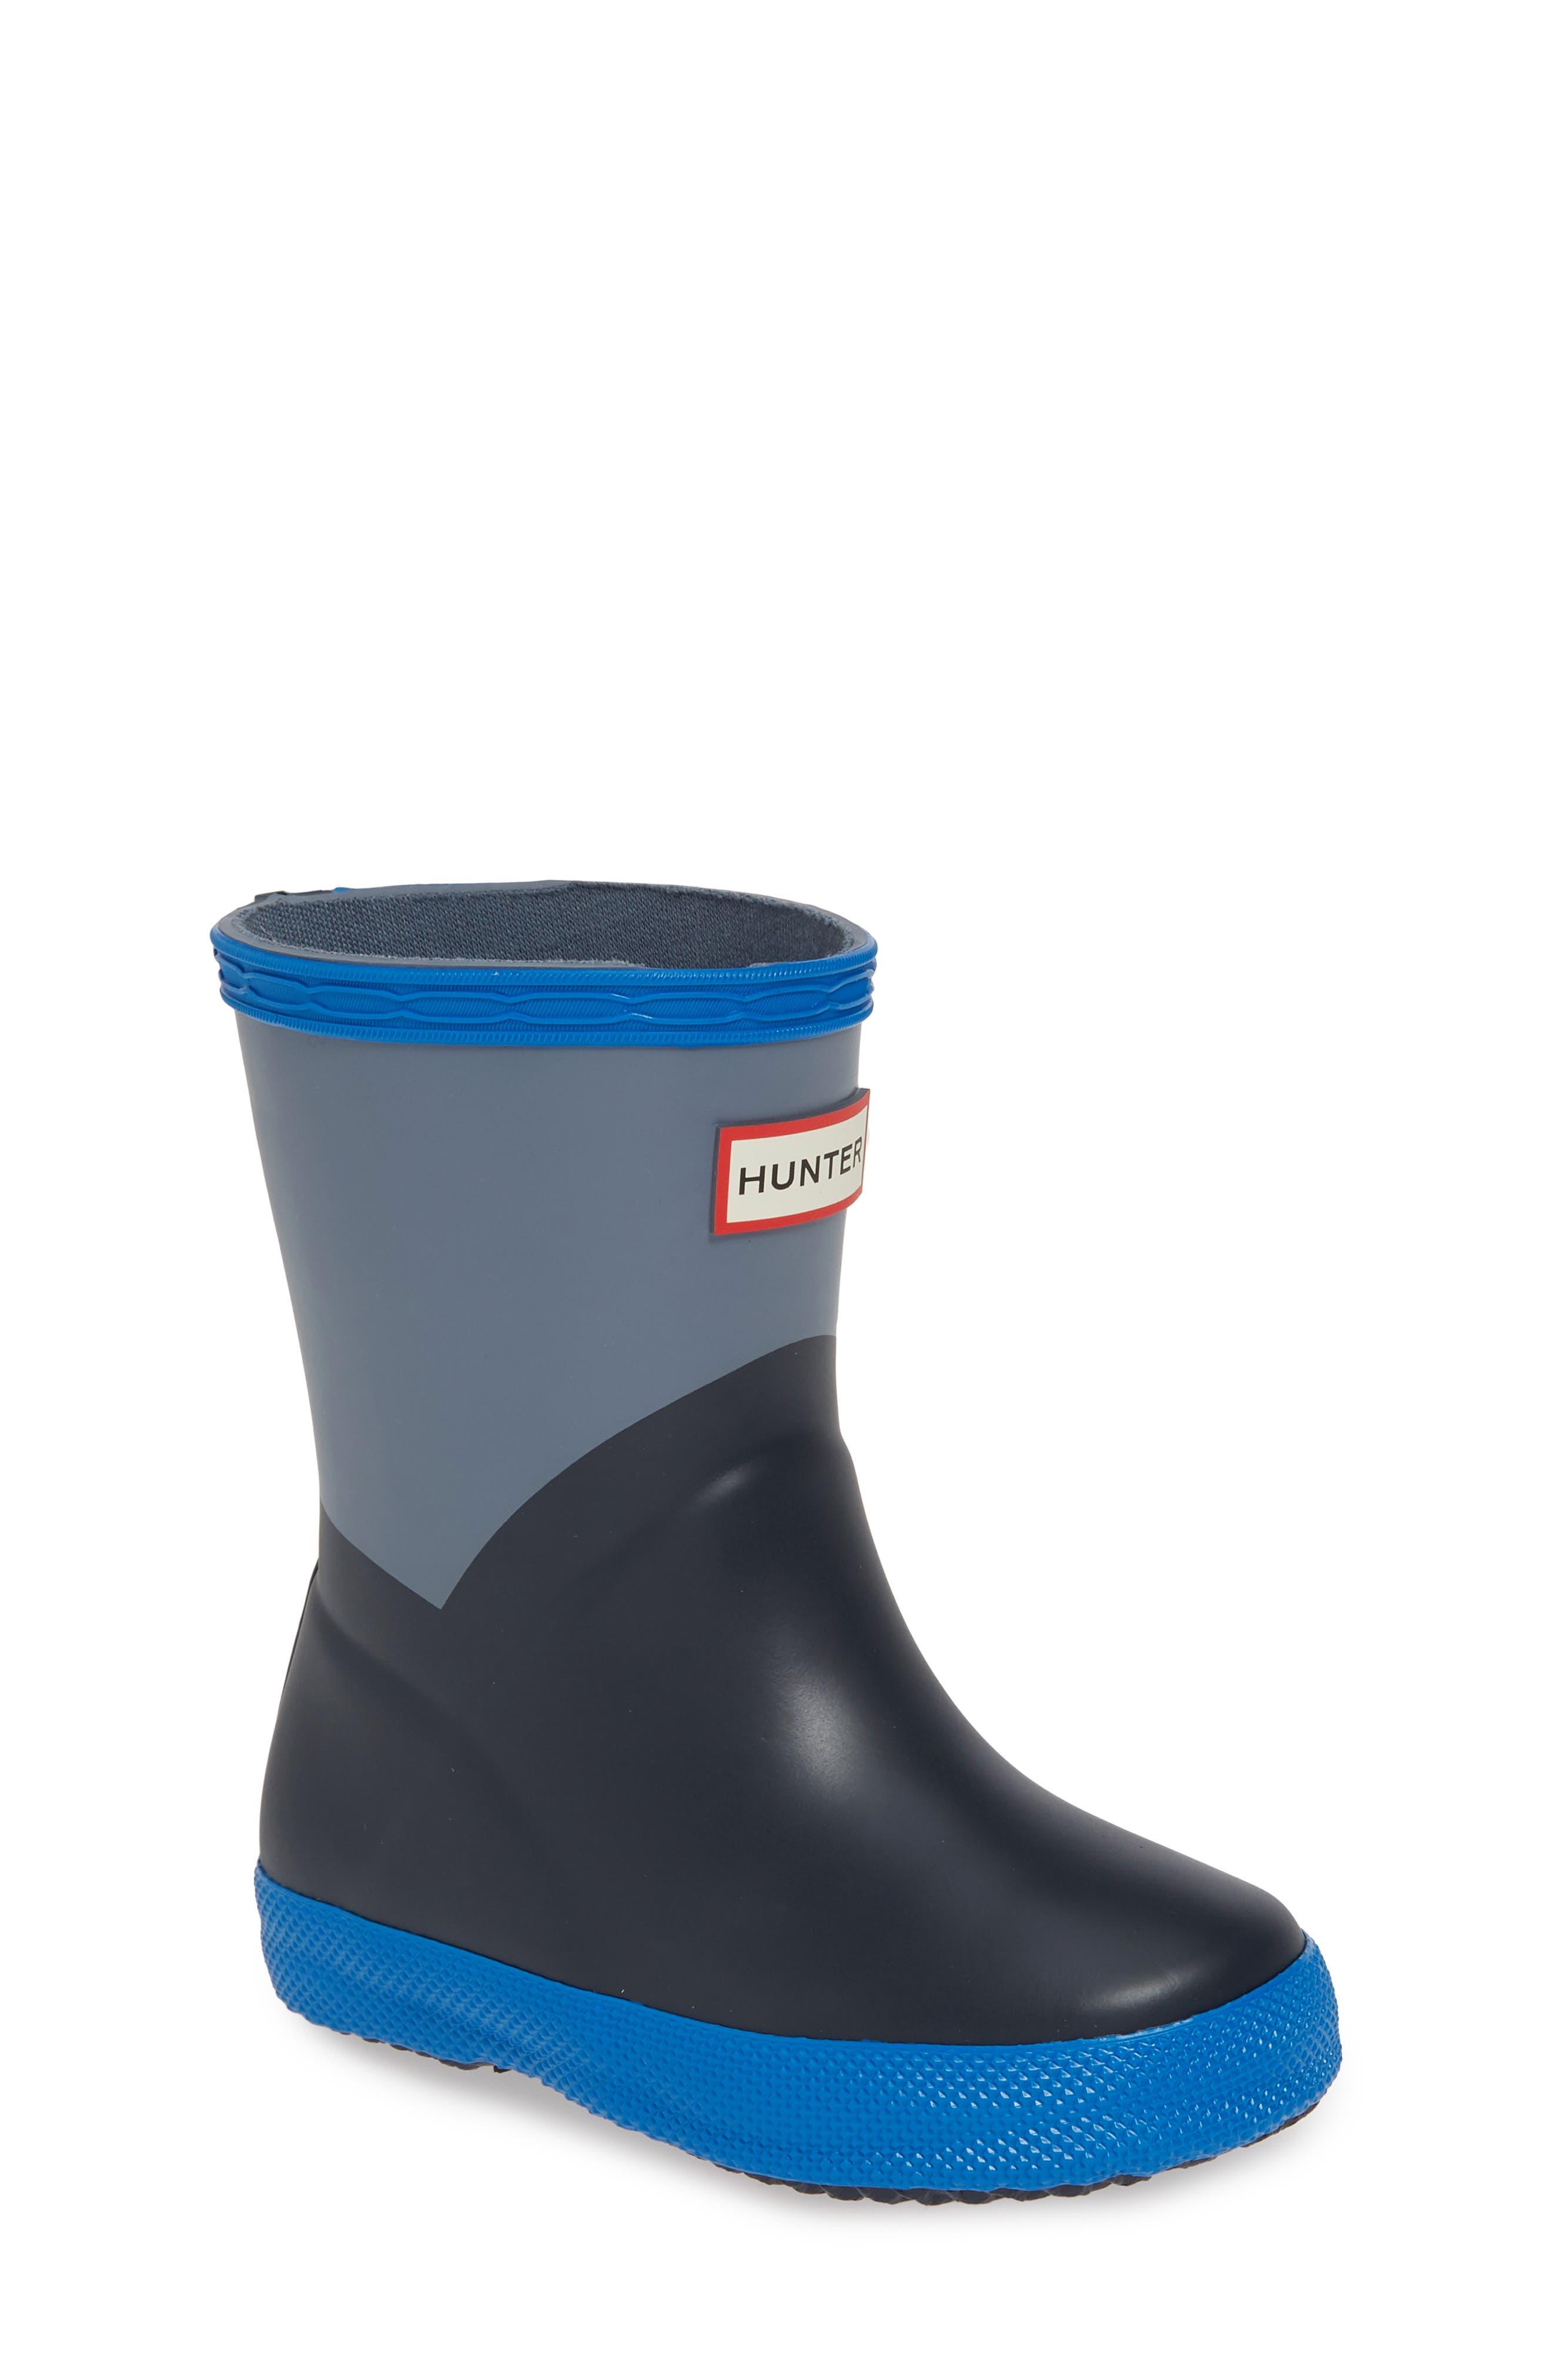 HUNTER,                             First Classic Waterproof Rain Boot,                             Main thumbnail 1, color,                             GULL GREY/ BUCKET BLUE/ NAVY